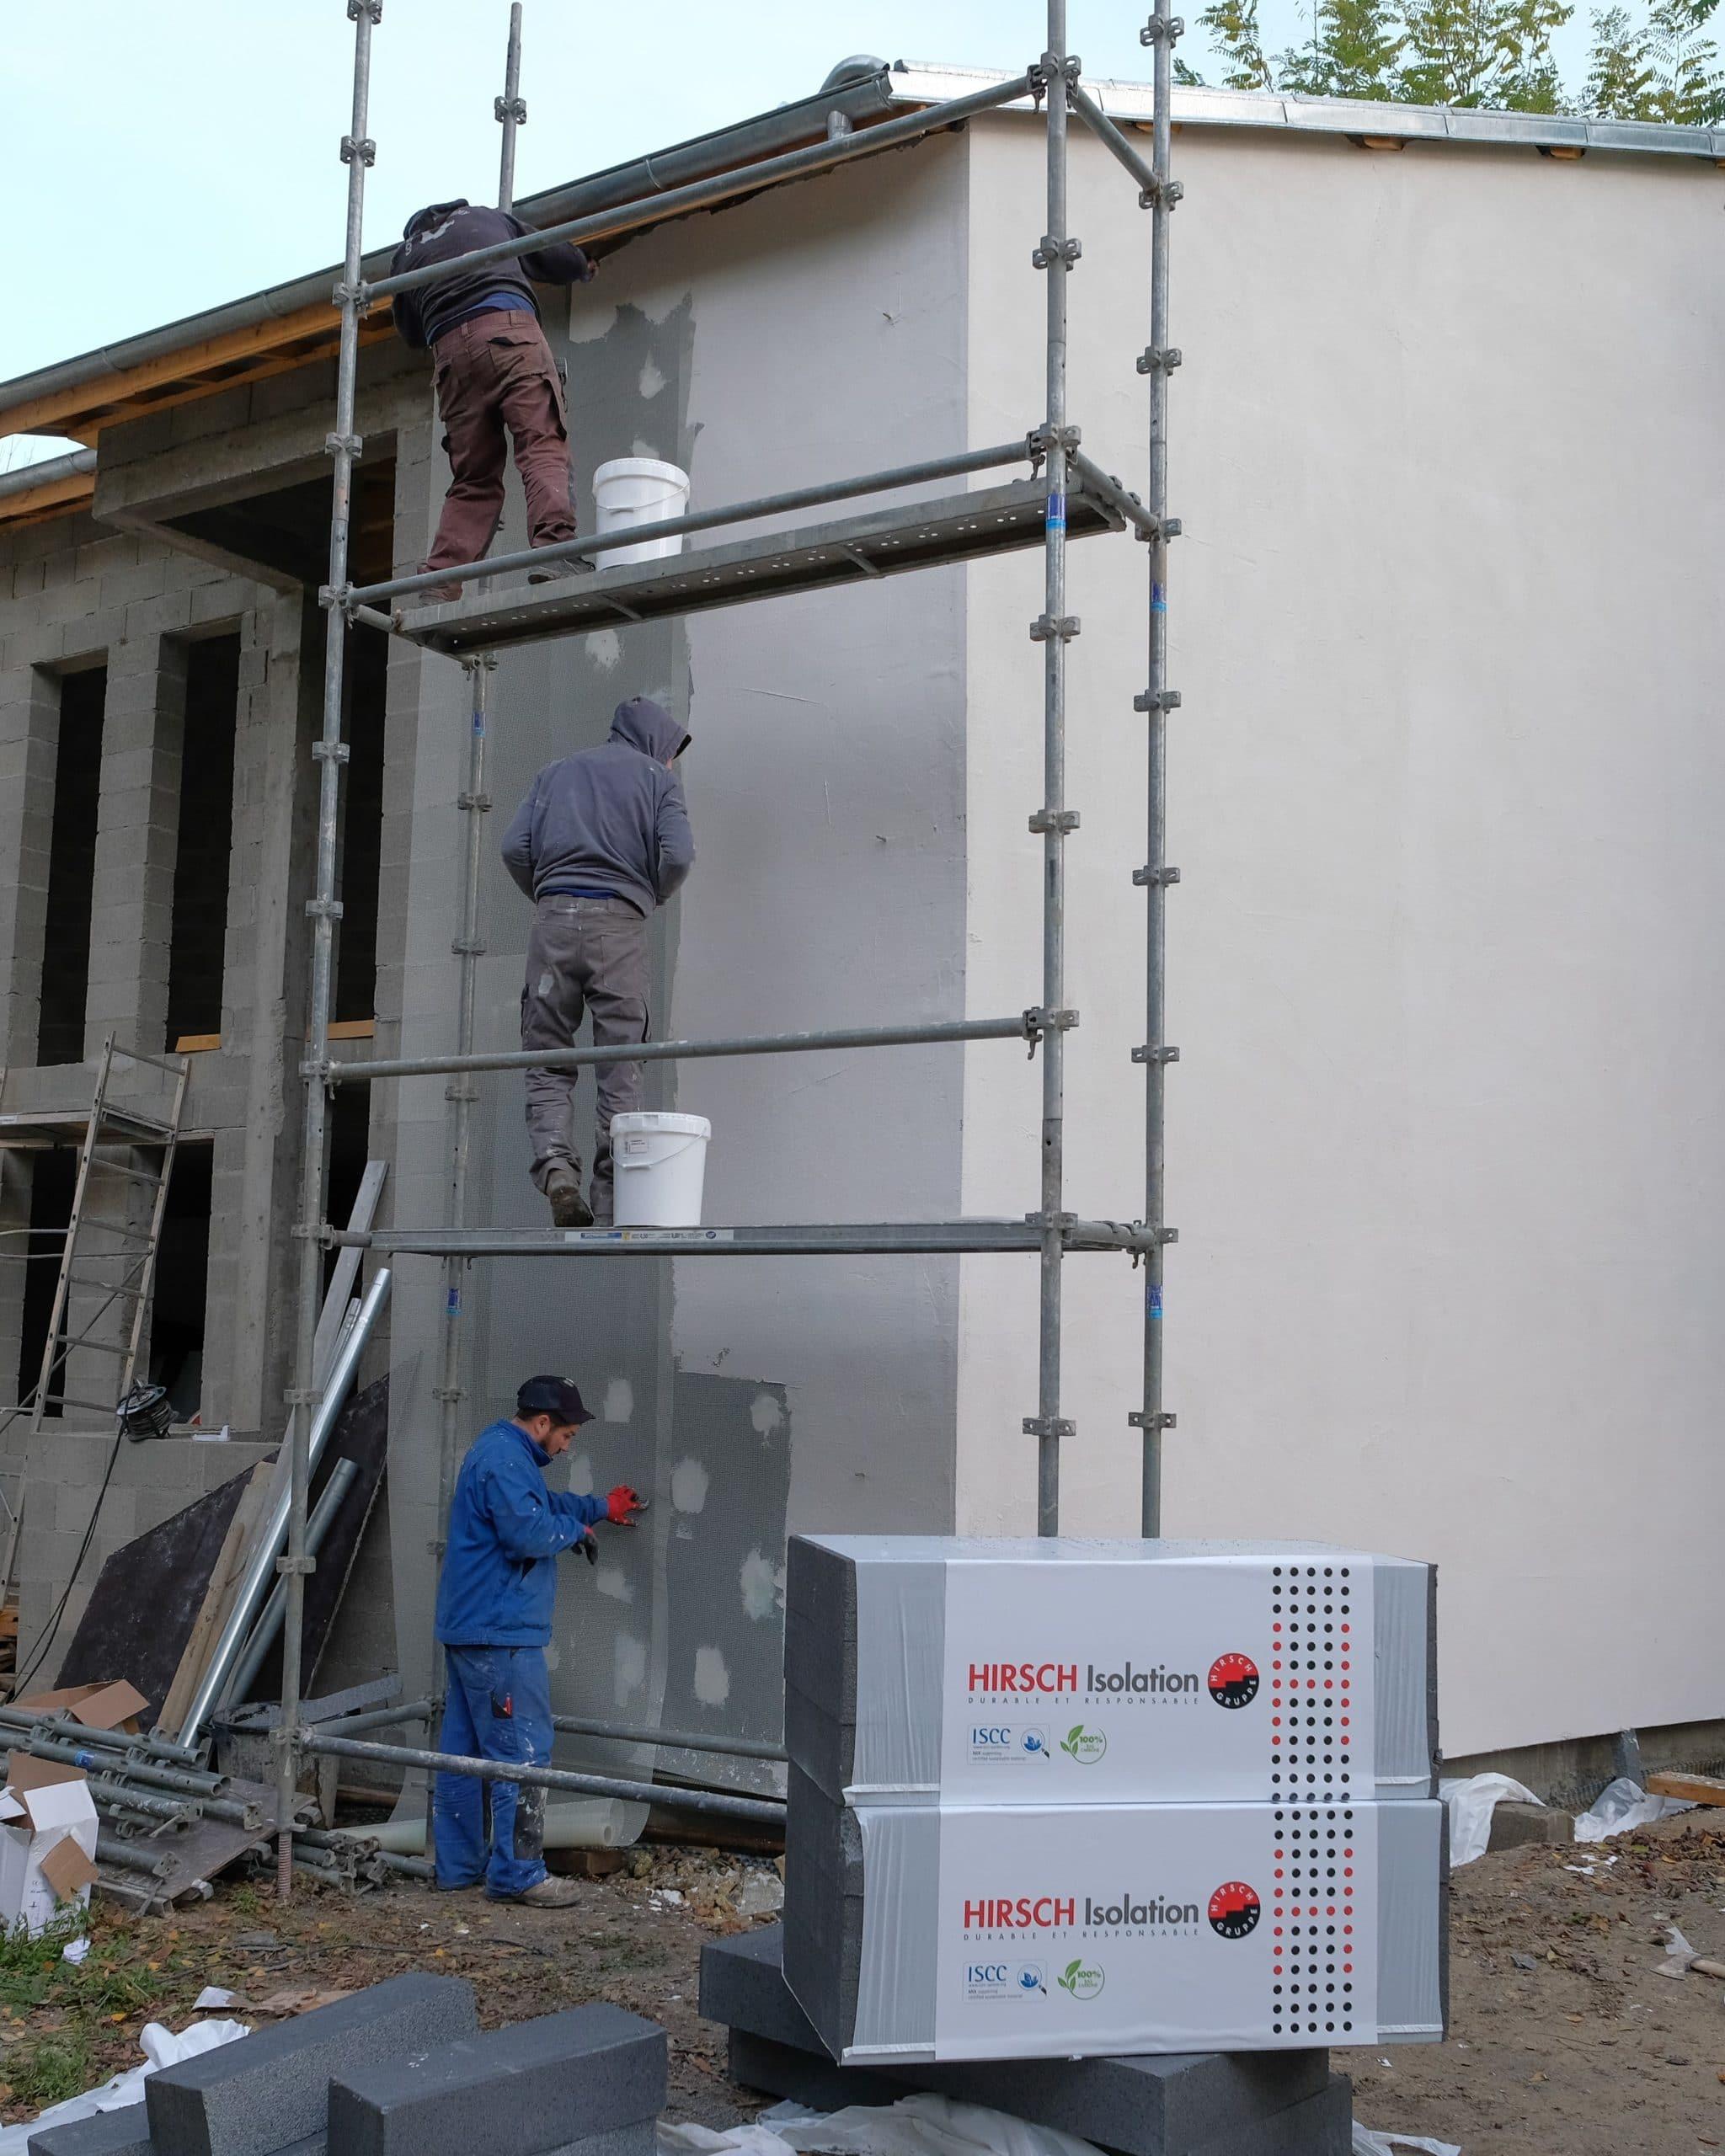 chantier ite hirsch isolation batiment construction